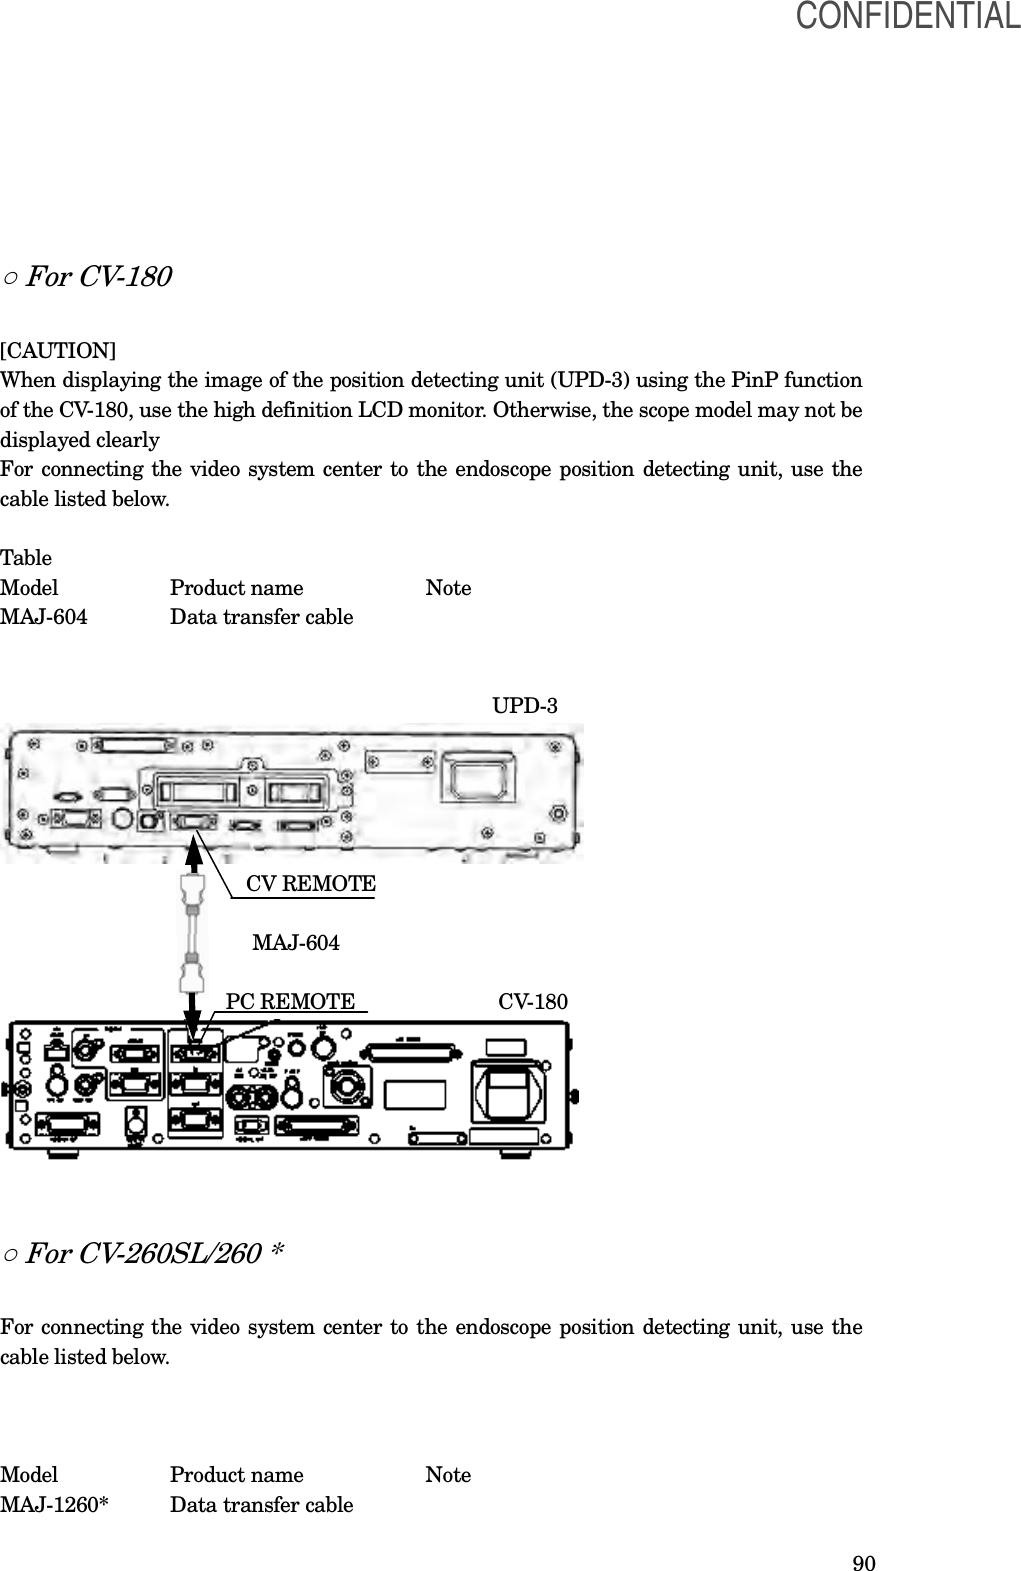 olympus cv 190 manual pdf